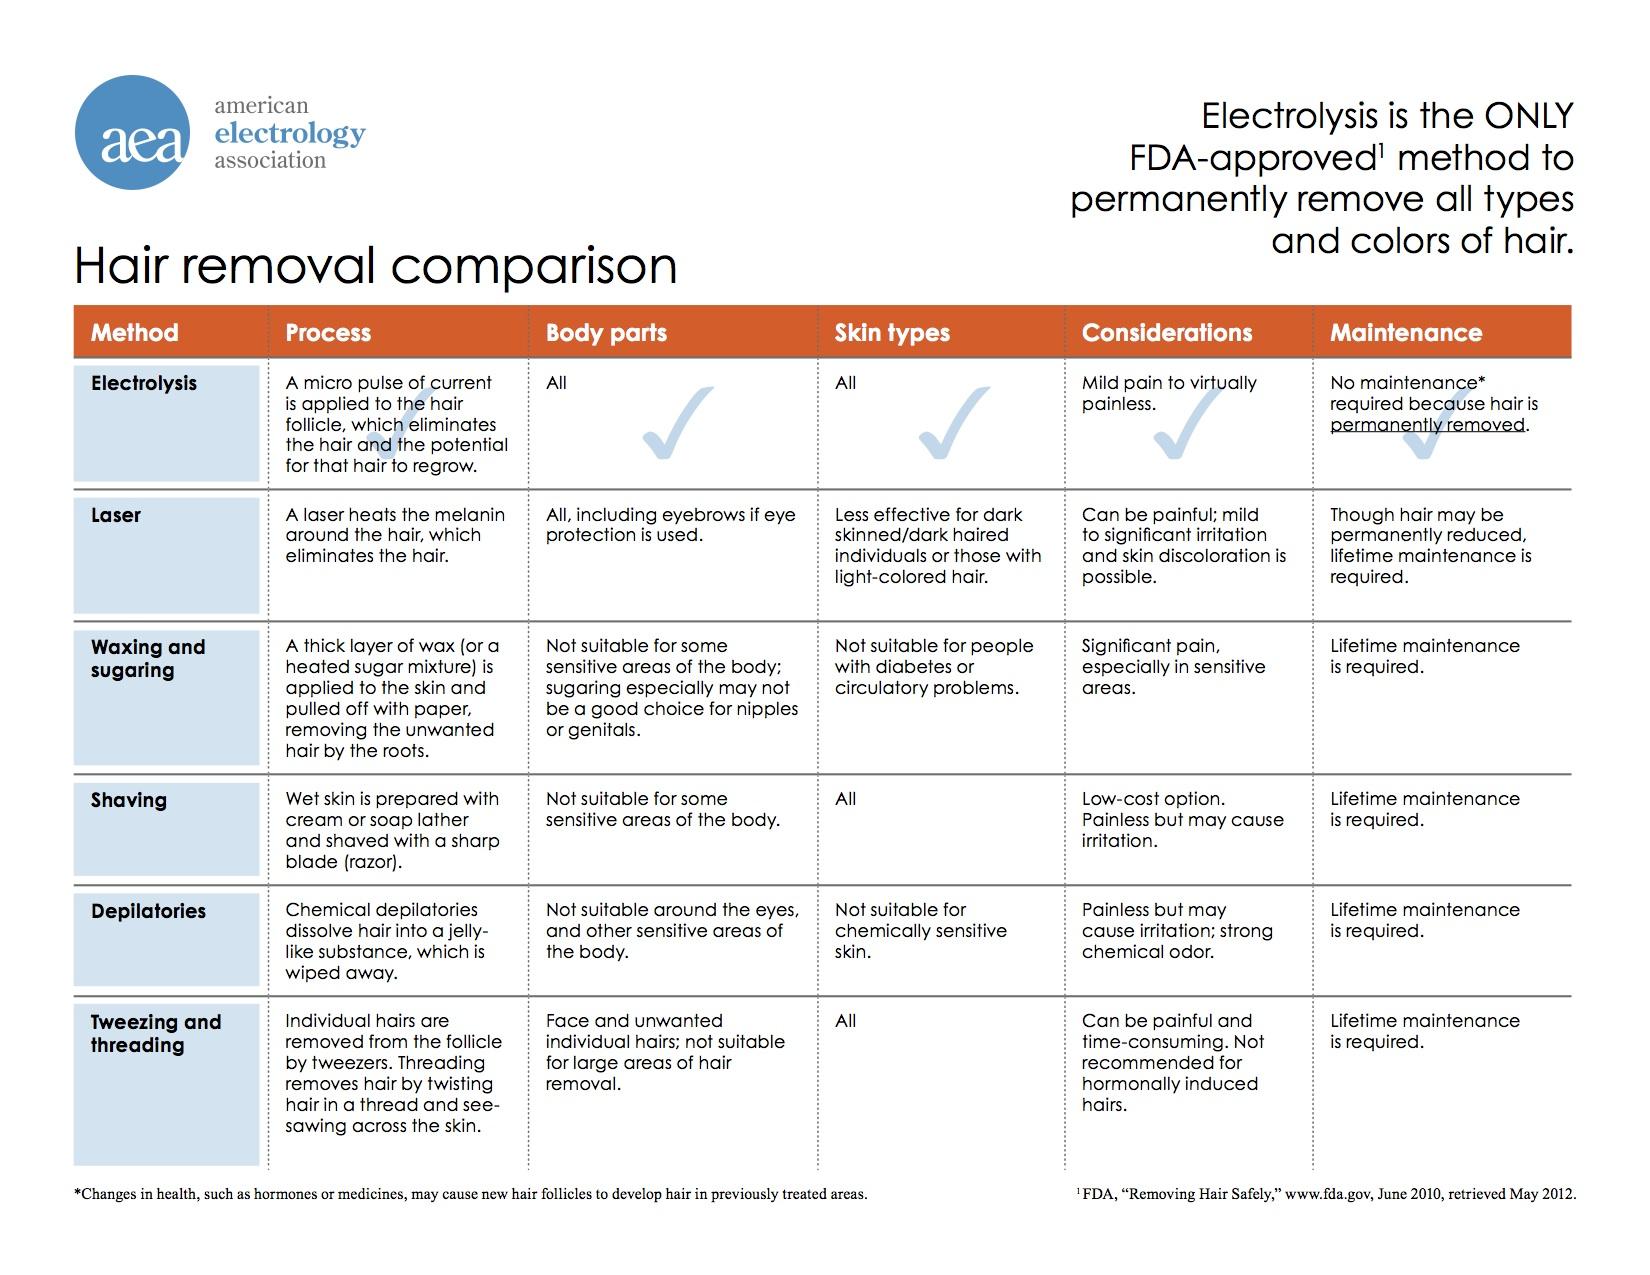 Electrolysis-comparison-chart